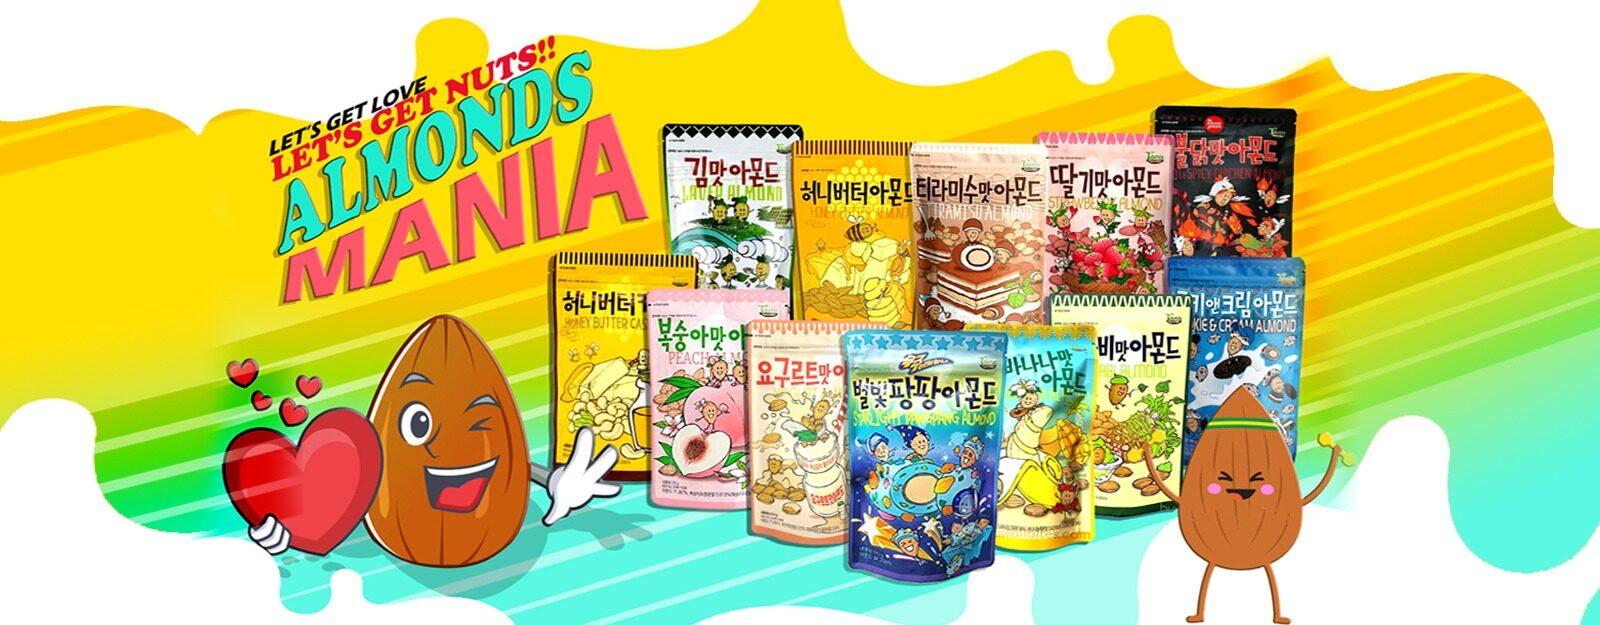 Almonds Mania